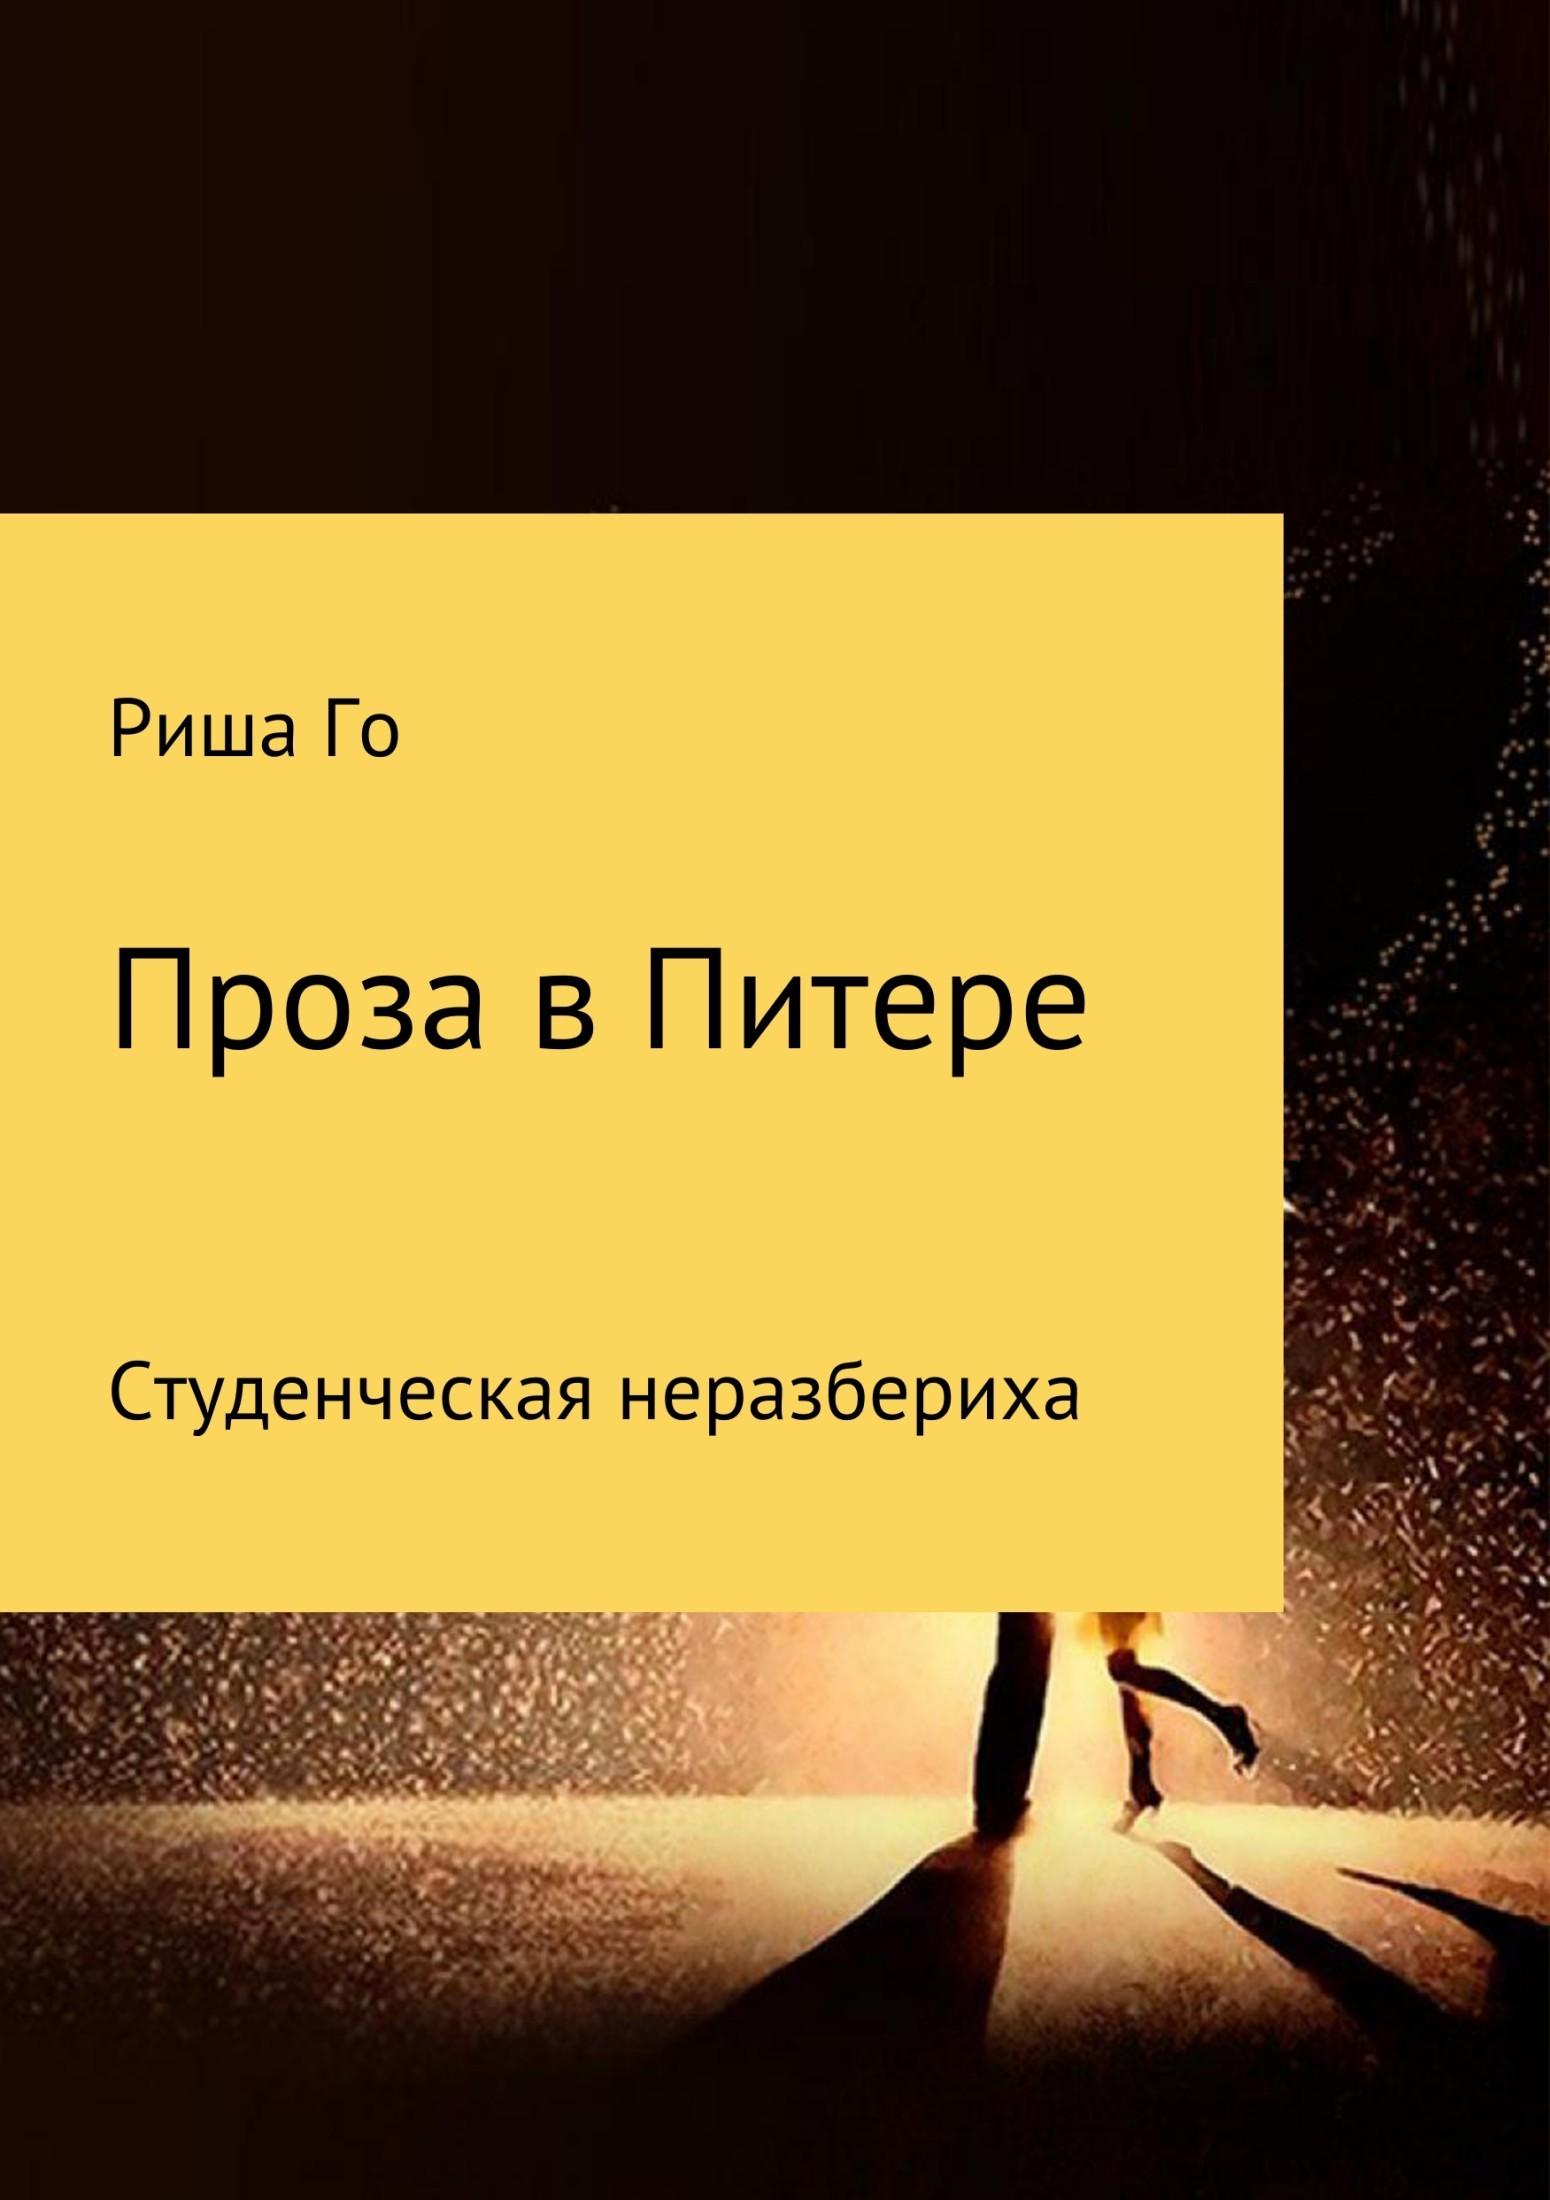 Ирина Михайловна Горбунова бесплатно